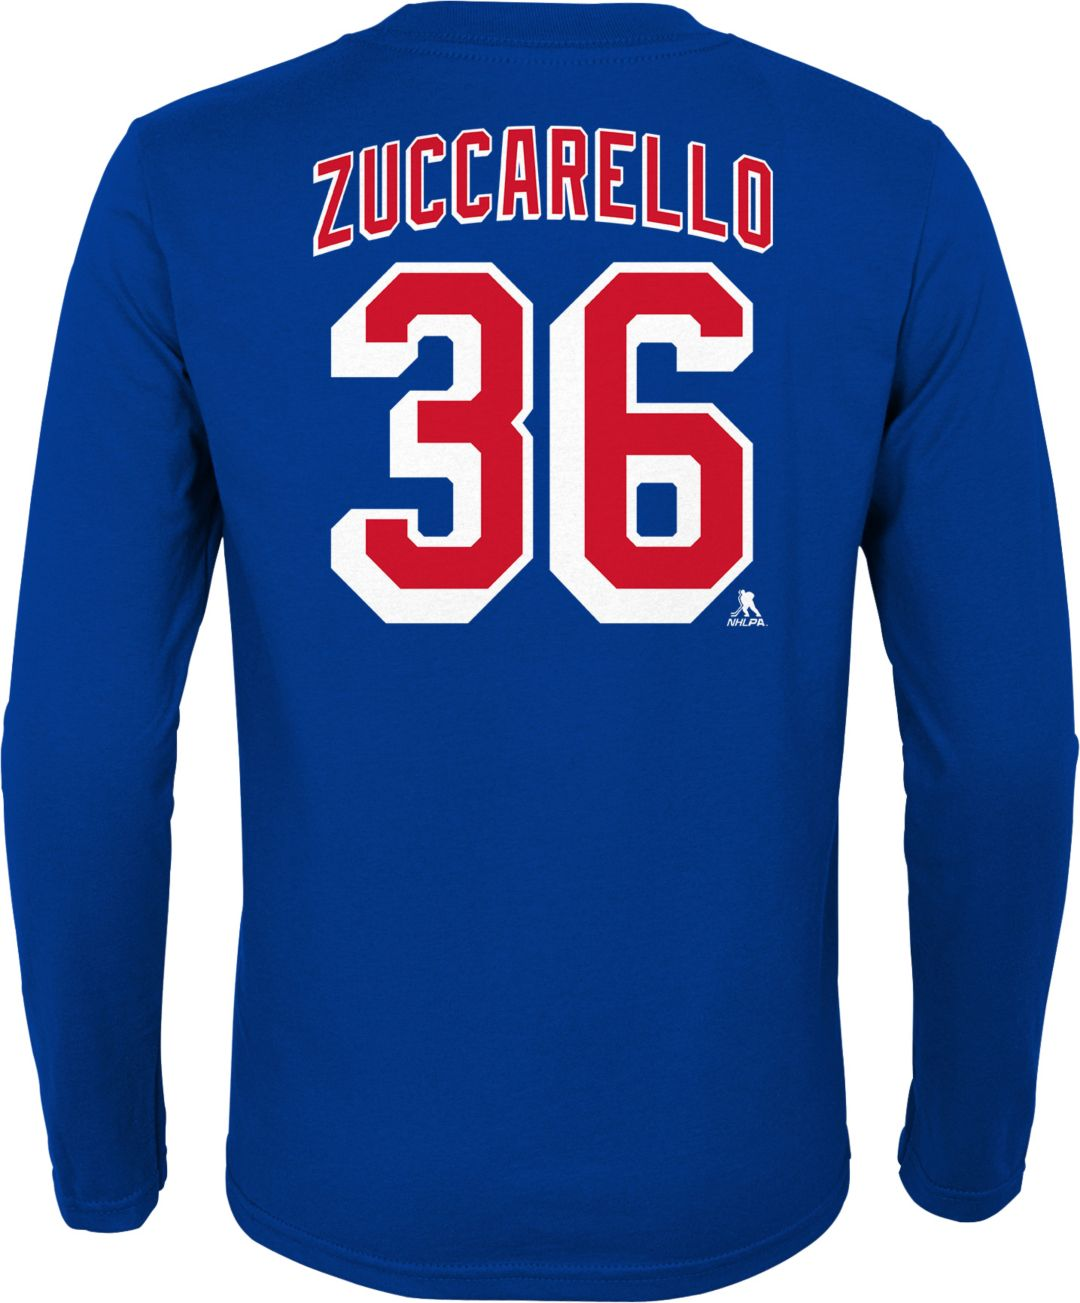 new arrival 51d46 640a7 NHL Youth New York Rangers Mats Zuccarello #36 Royal Long Sleeve Player  Shirt